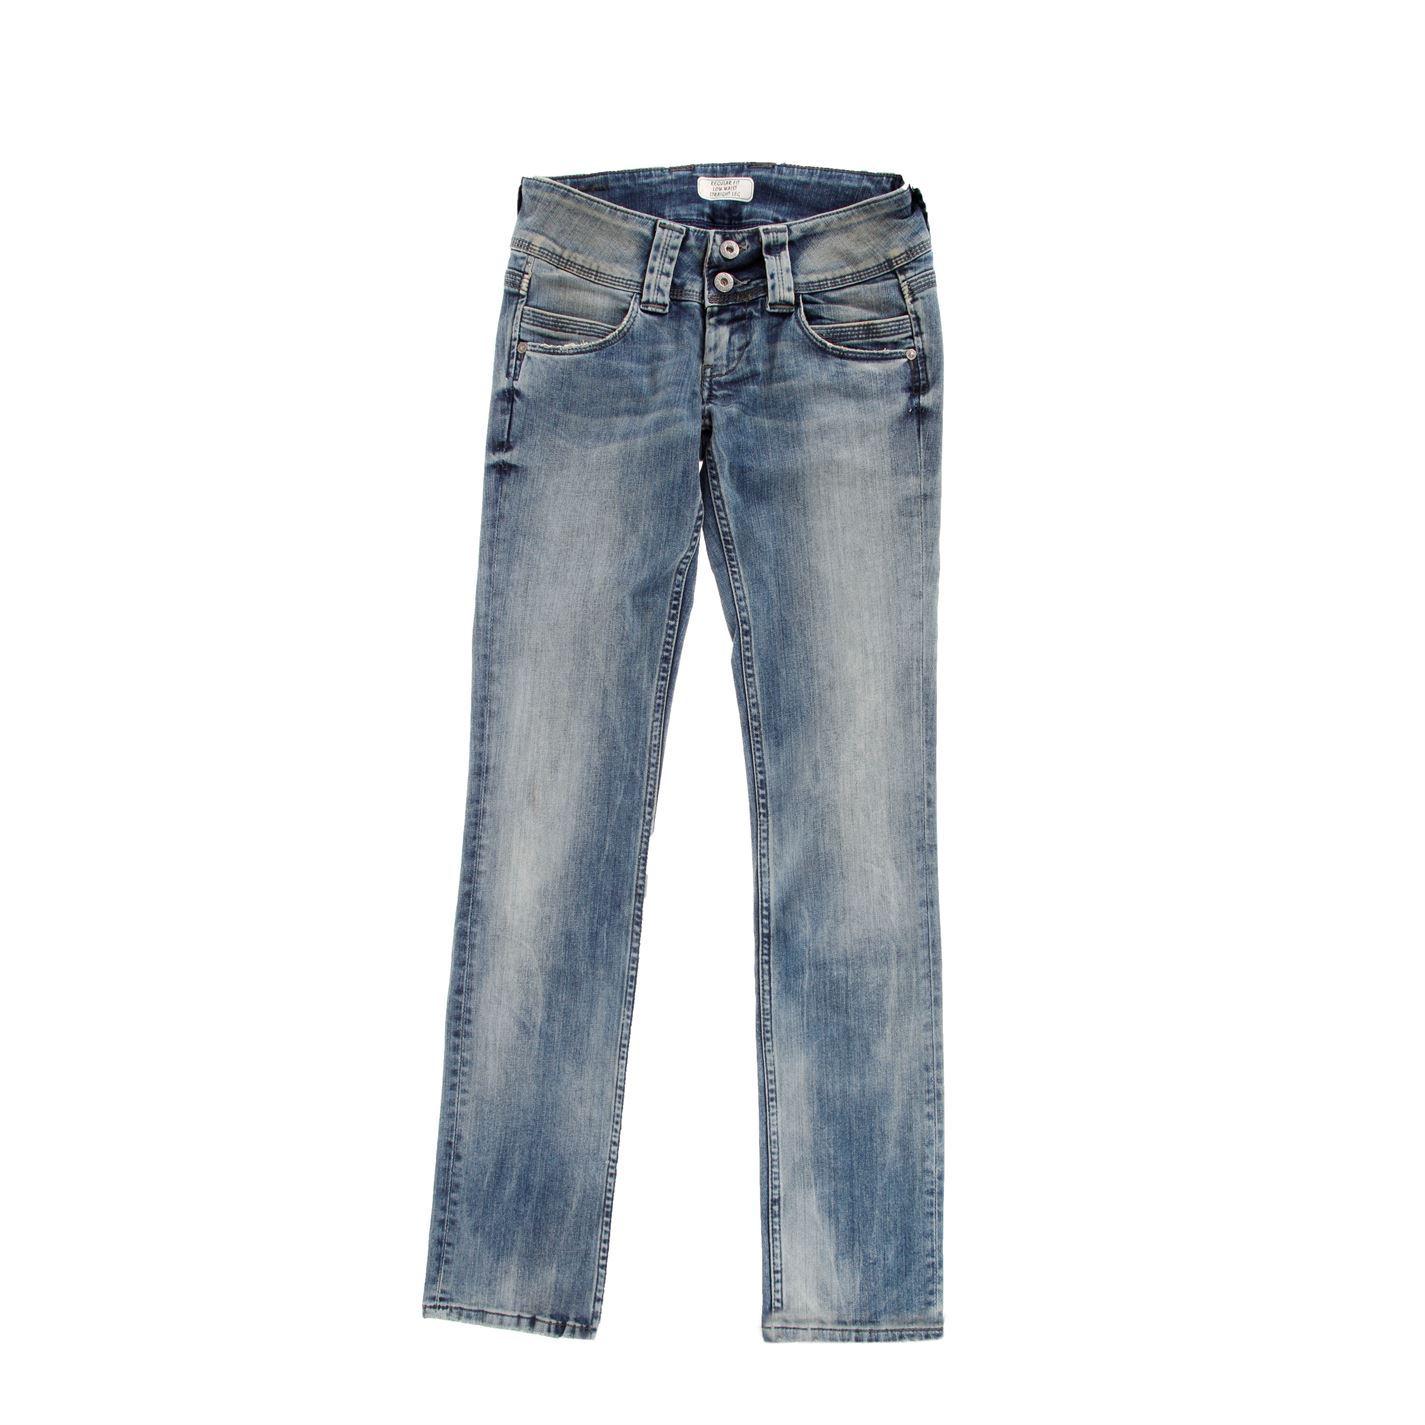 pepe jeans womens ladies venus trousers pants bottoms. Black Bedroom Furniture Sets. Home Design Ideas